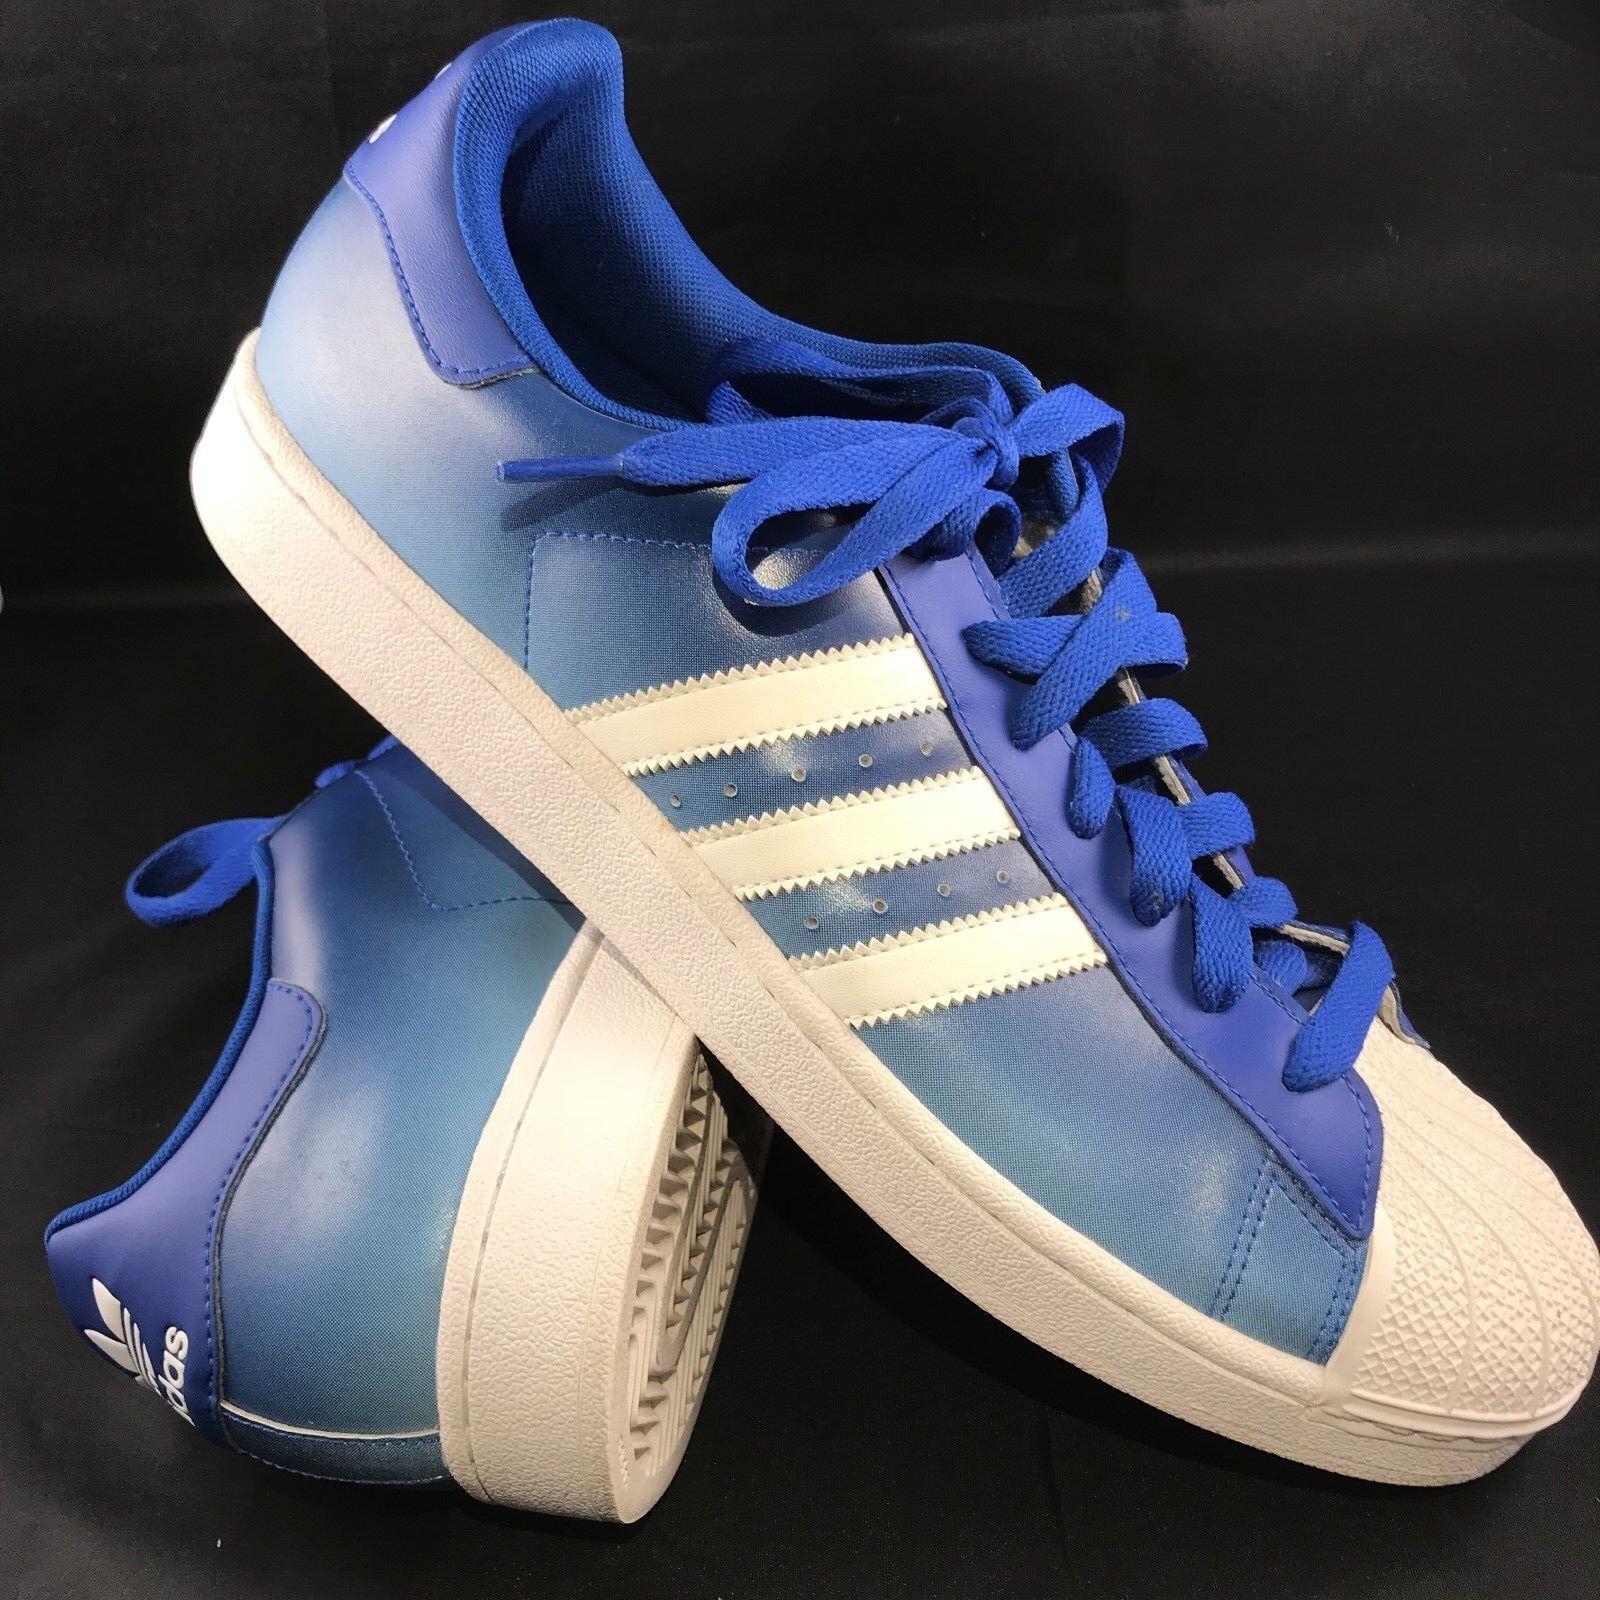 Adidas superstar blu in edizione limitata euro